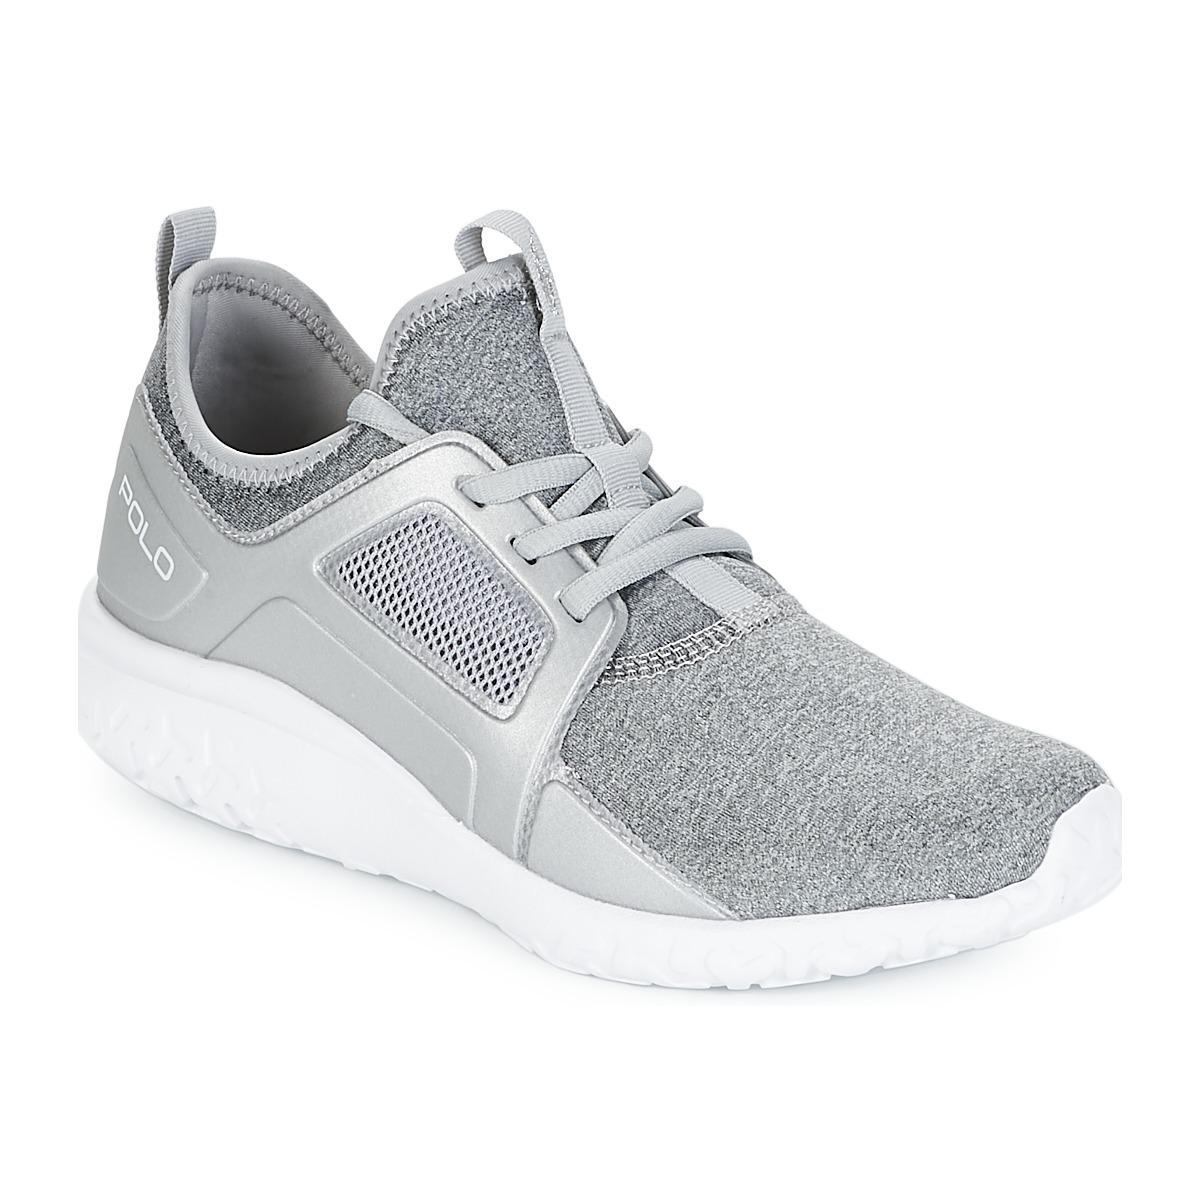 24d9164b6 Polo Ralph Lauren Train 150 Women s Shoes (trainers) In Grey in Gray ...